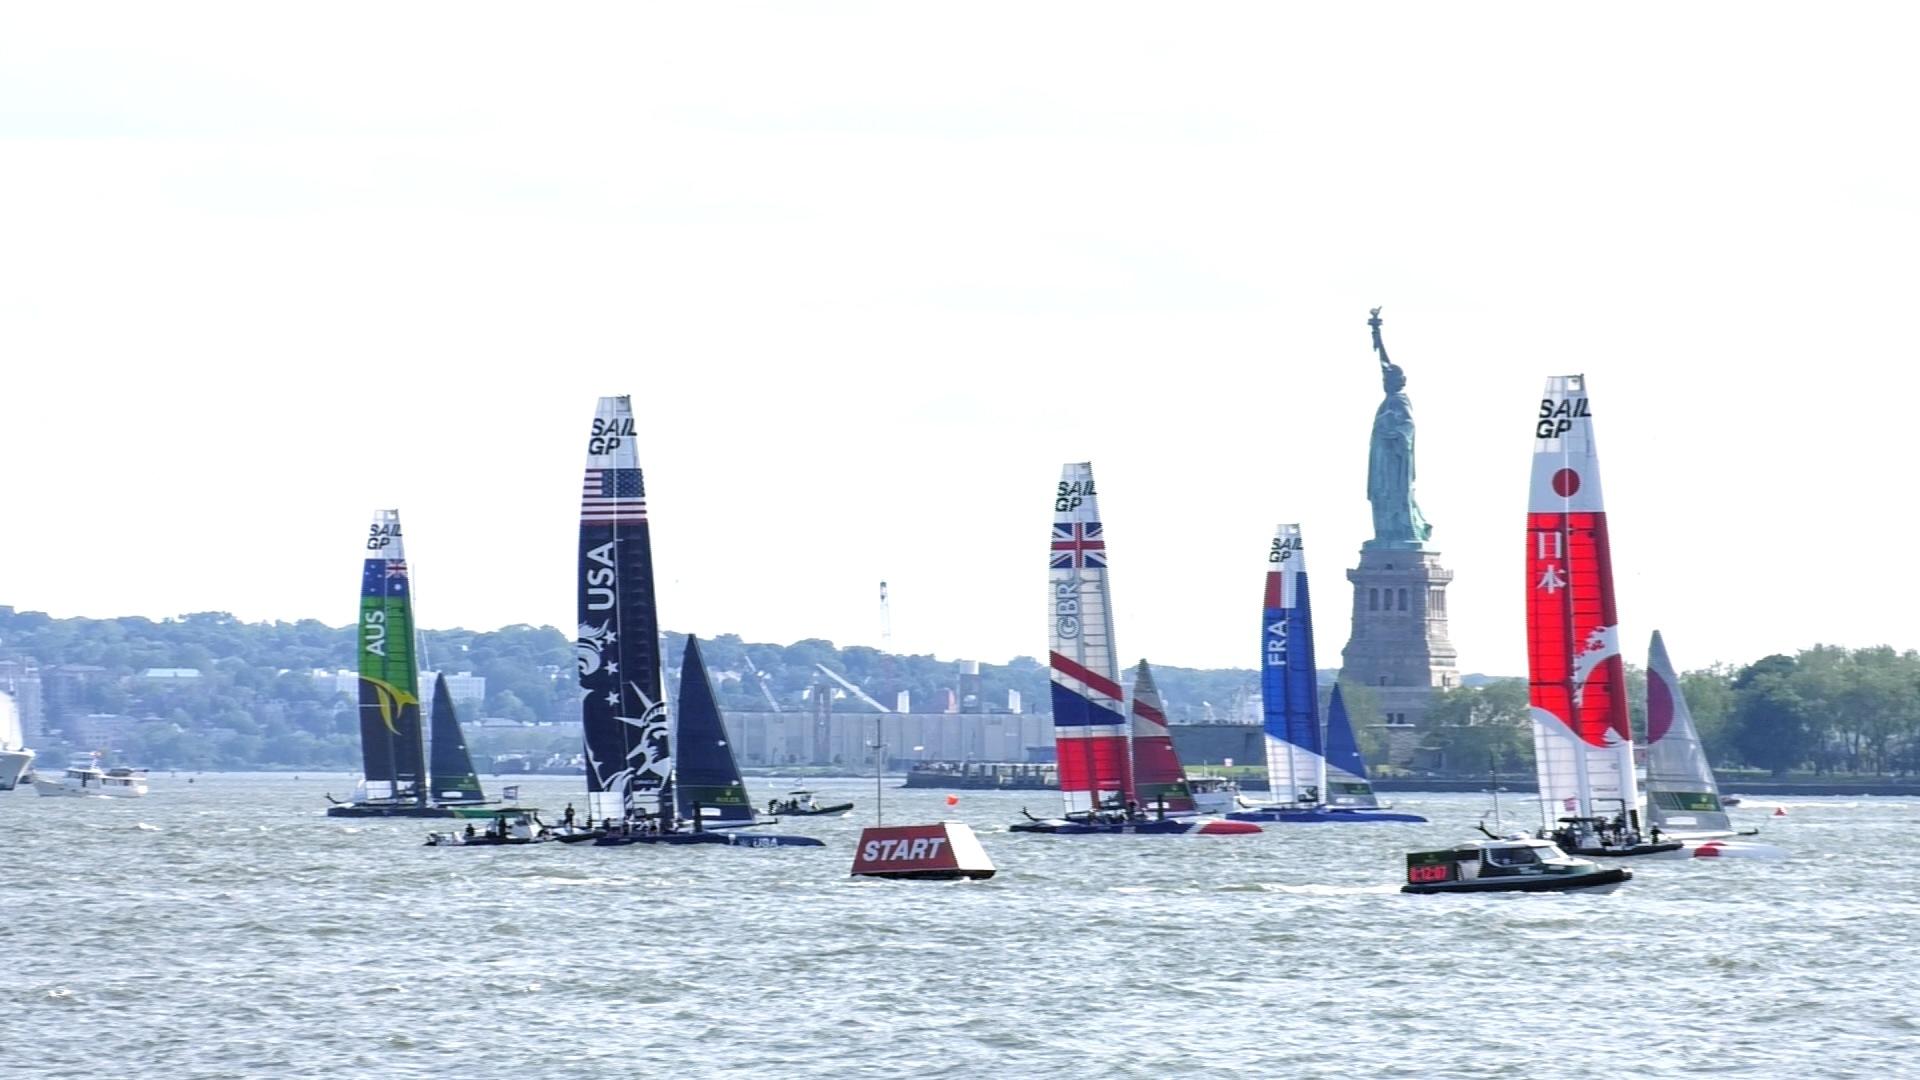 Image: 日本が優勝!ヨットレースの世界大会「Sail GP」&特集:ゴミを出さない生活